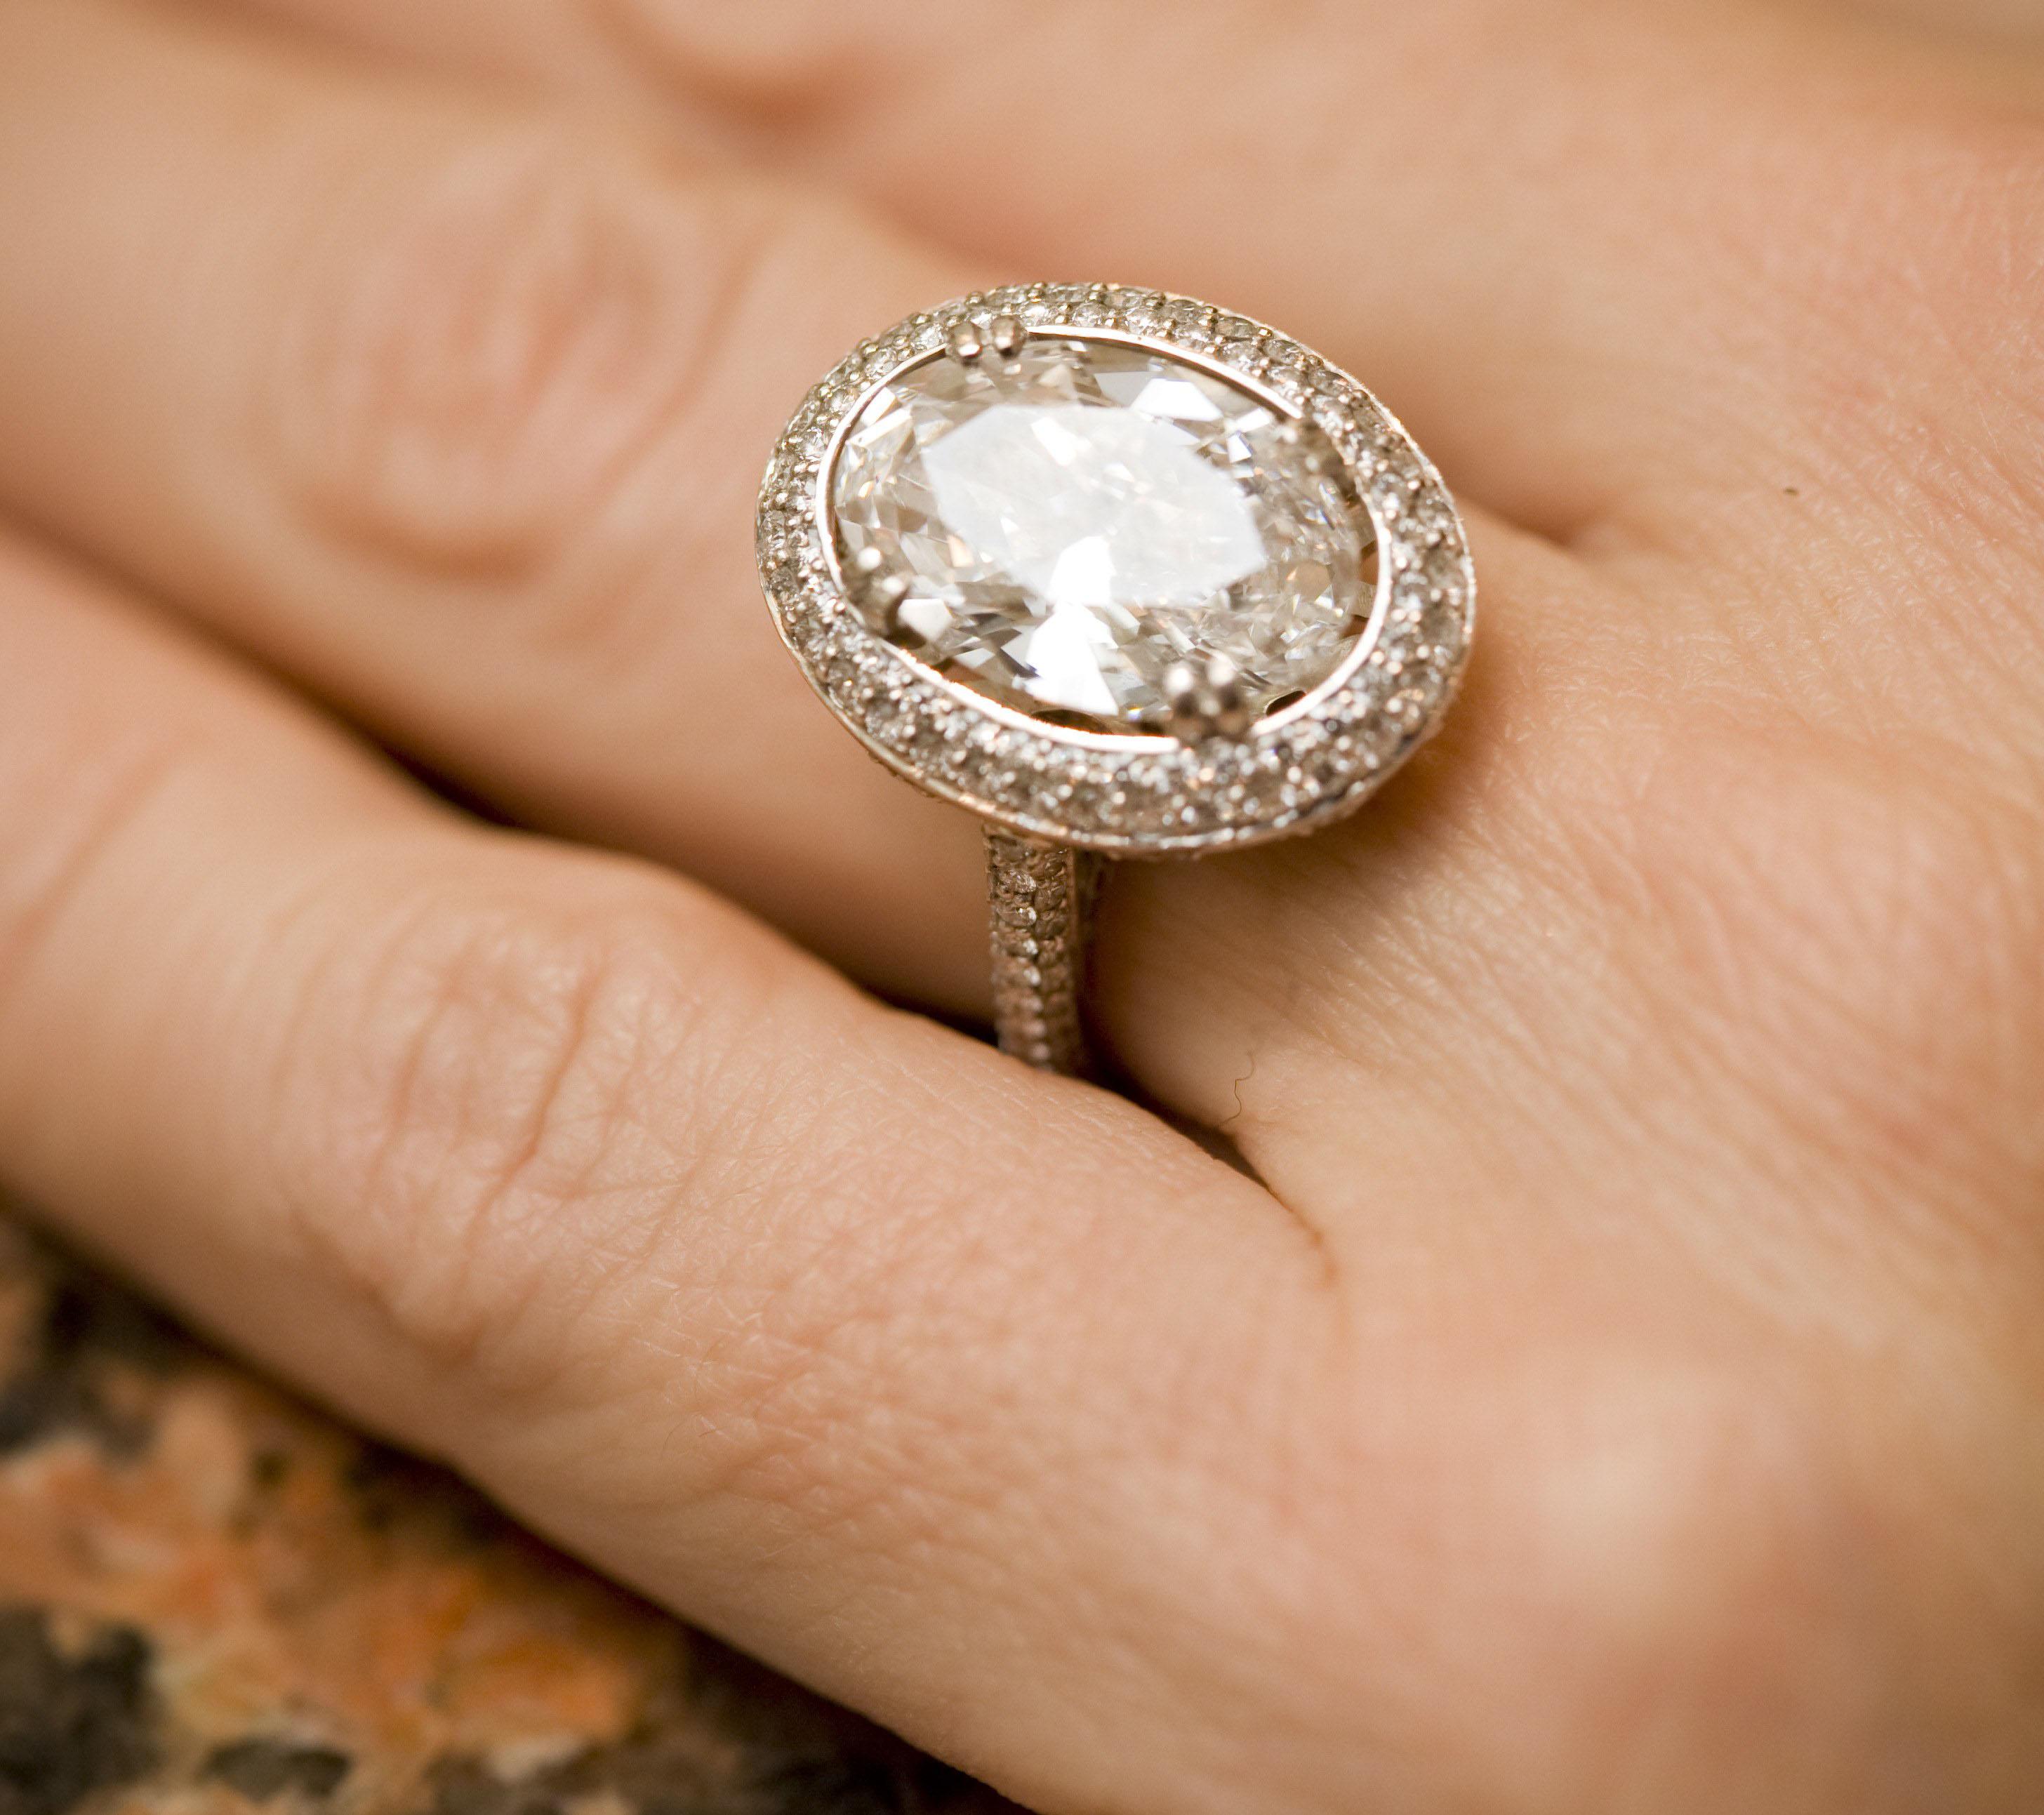 adrienne bailon engagement ring inspiration, oval halo diamond ring